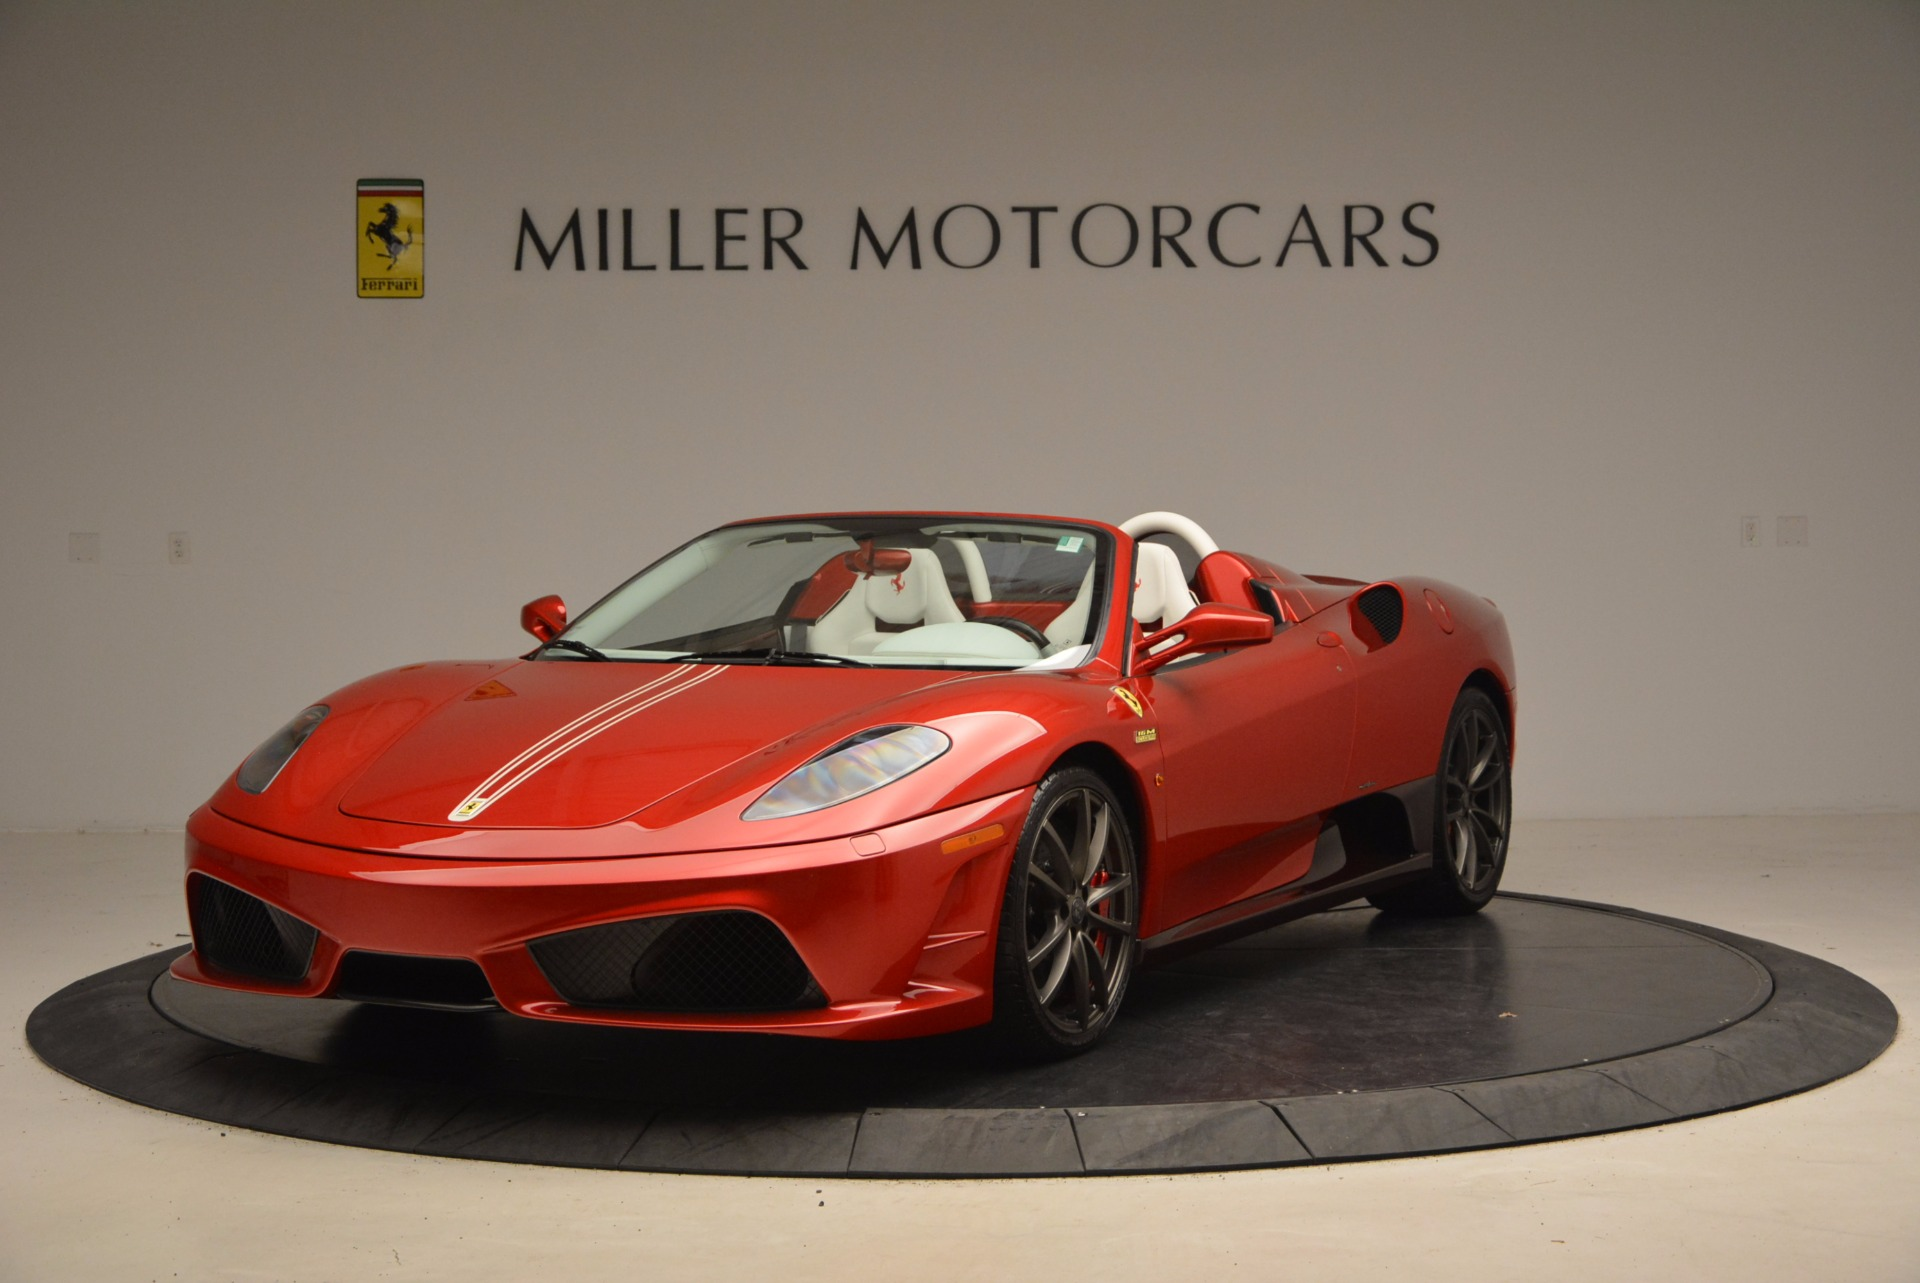 Used 2009 Ferrari F430 Scuderia 16M for sale Sold at McLaren Greenwich in Greenwich CT 06830 1